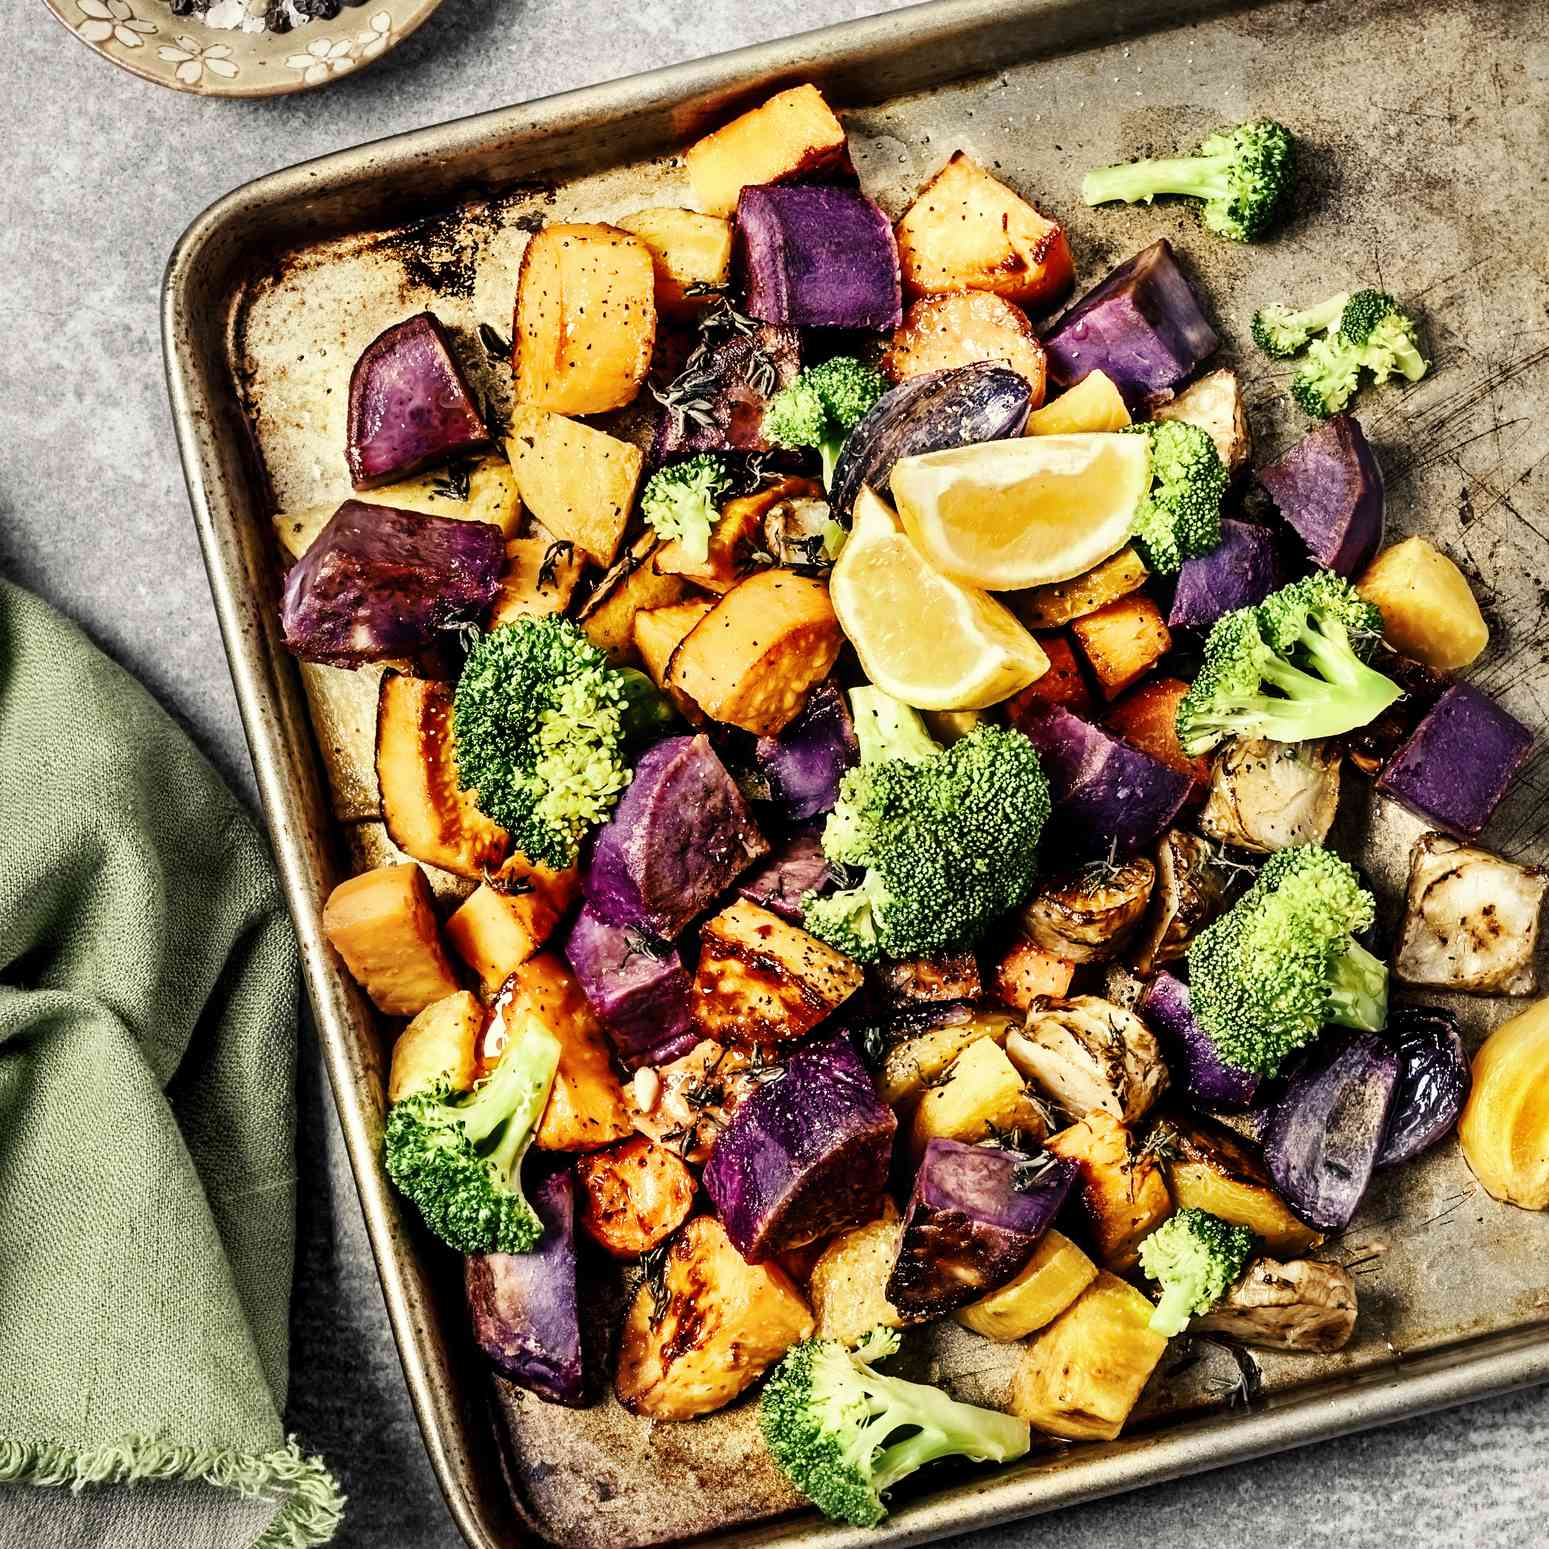 Tray of roast vegetables